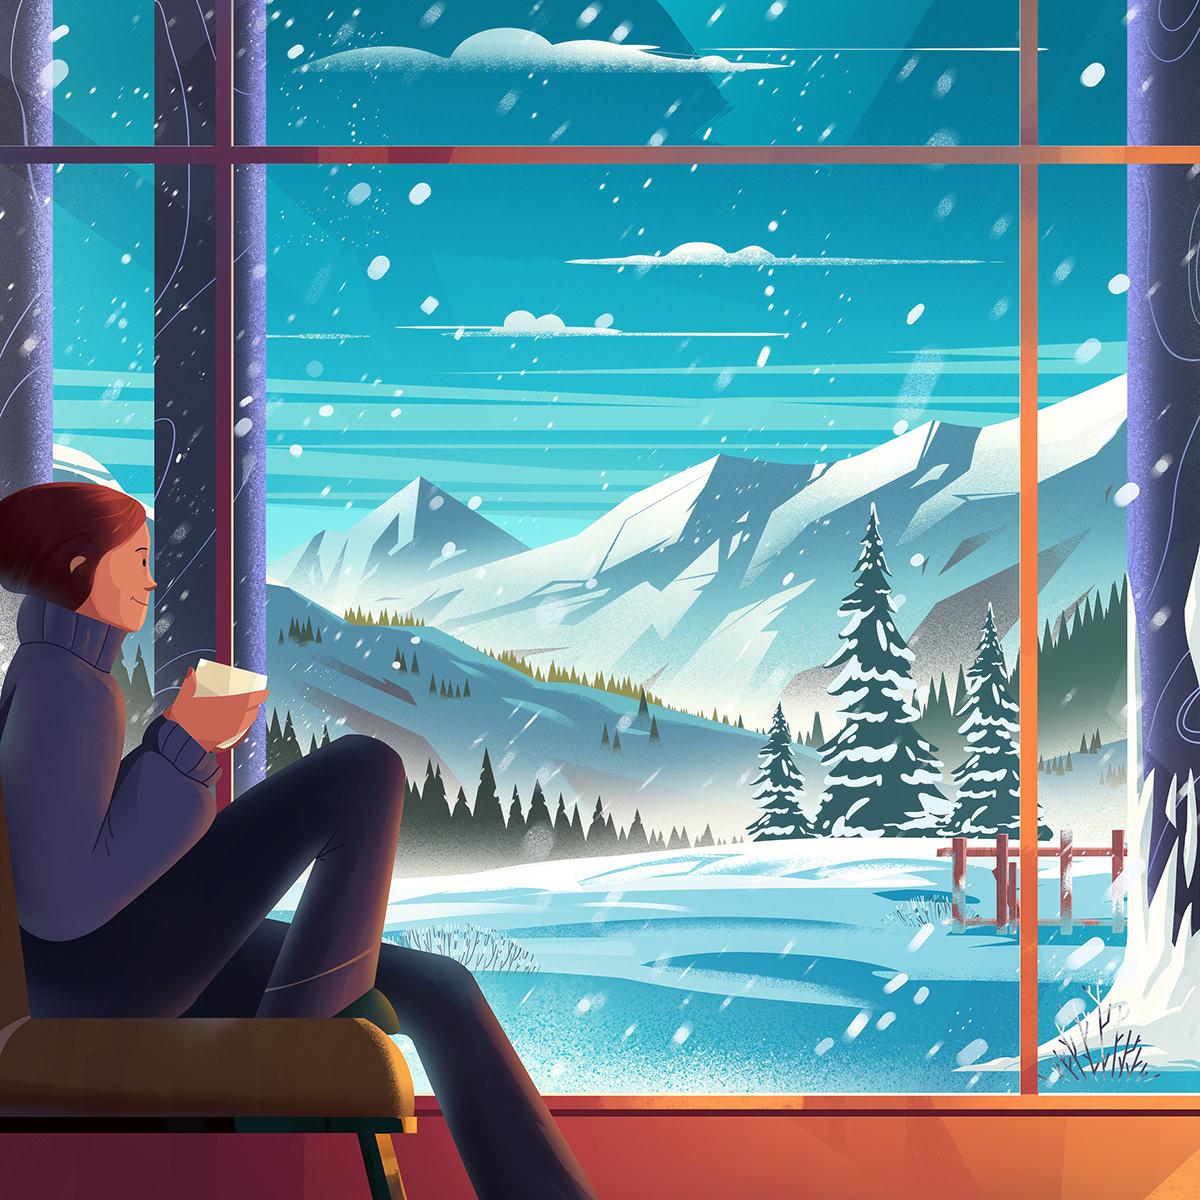 Image may contain: snow and screenshot